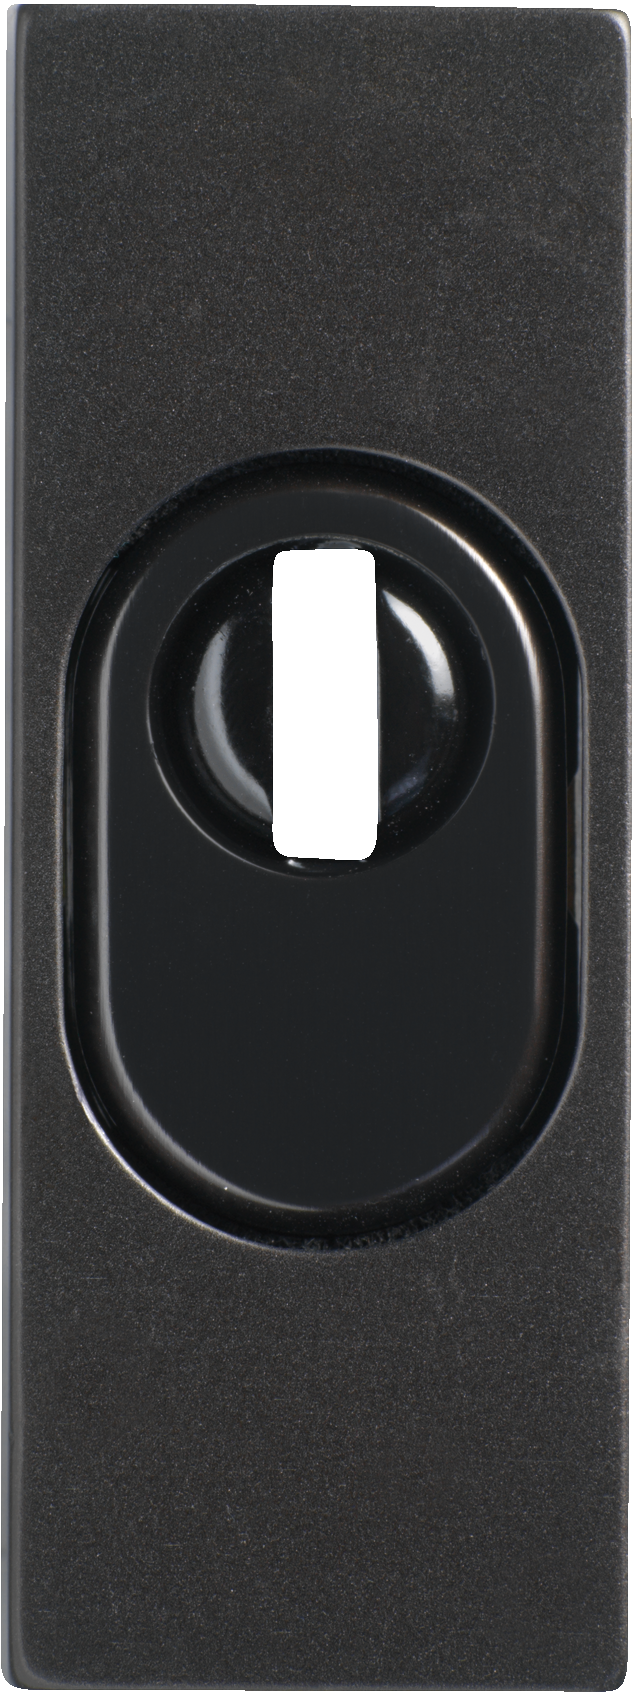 Schutzrosette RSZS316 B7 EK